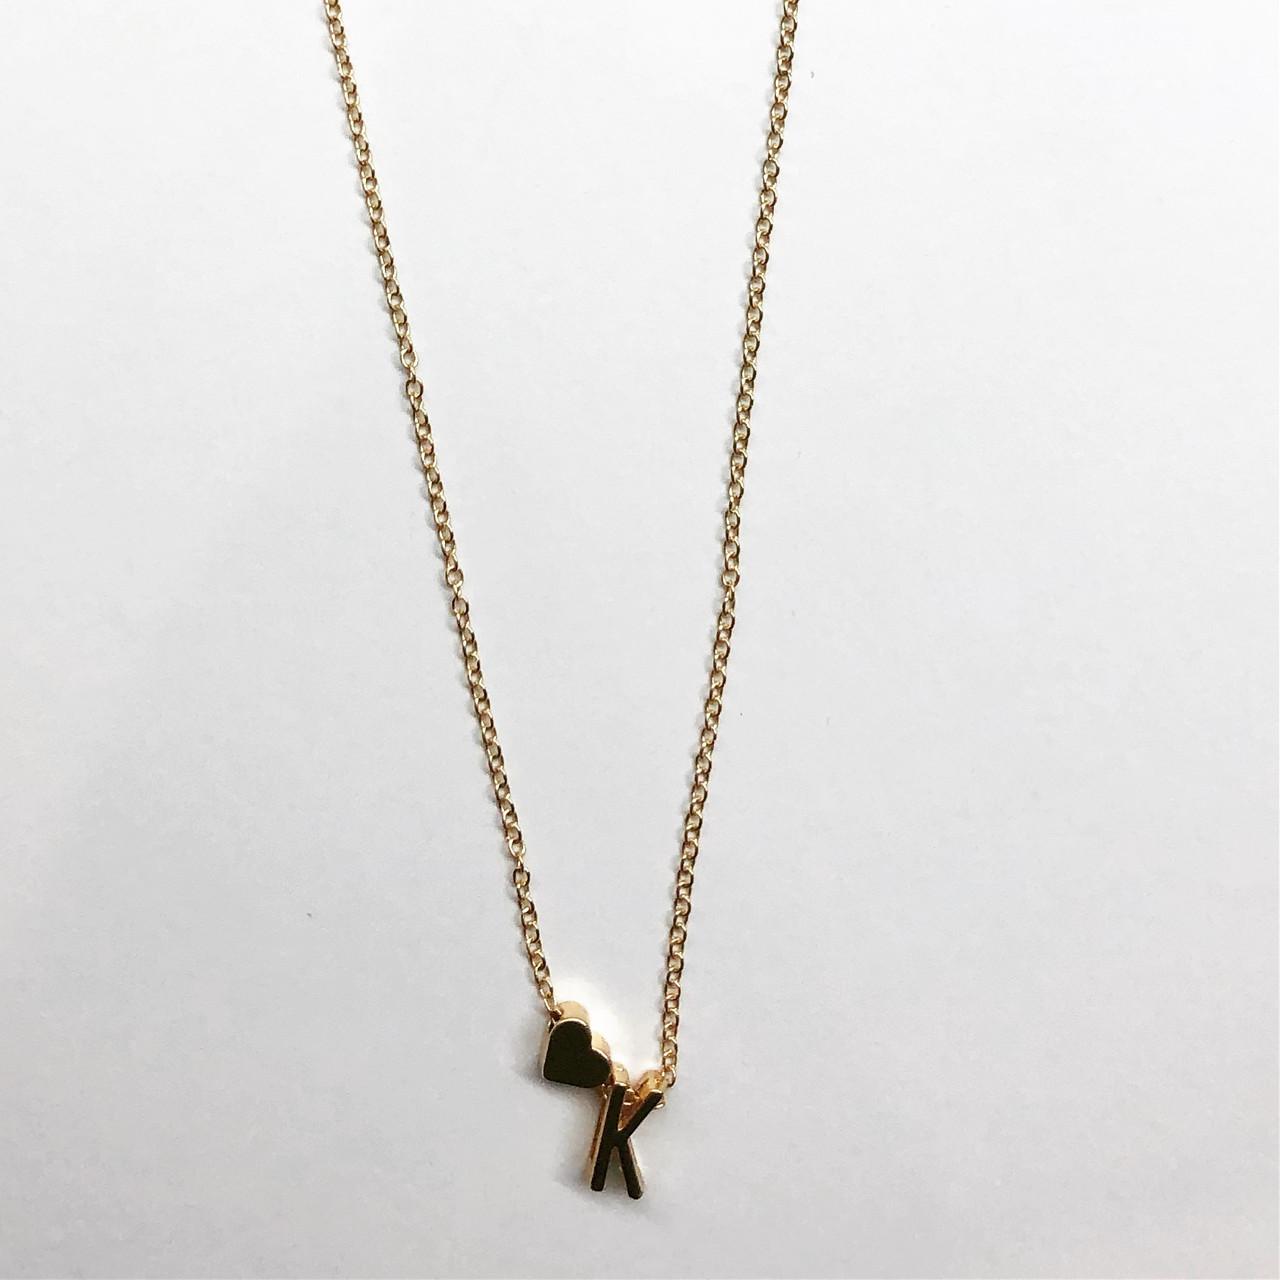 Кулон Turkish Jewels в форме буквы K